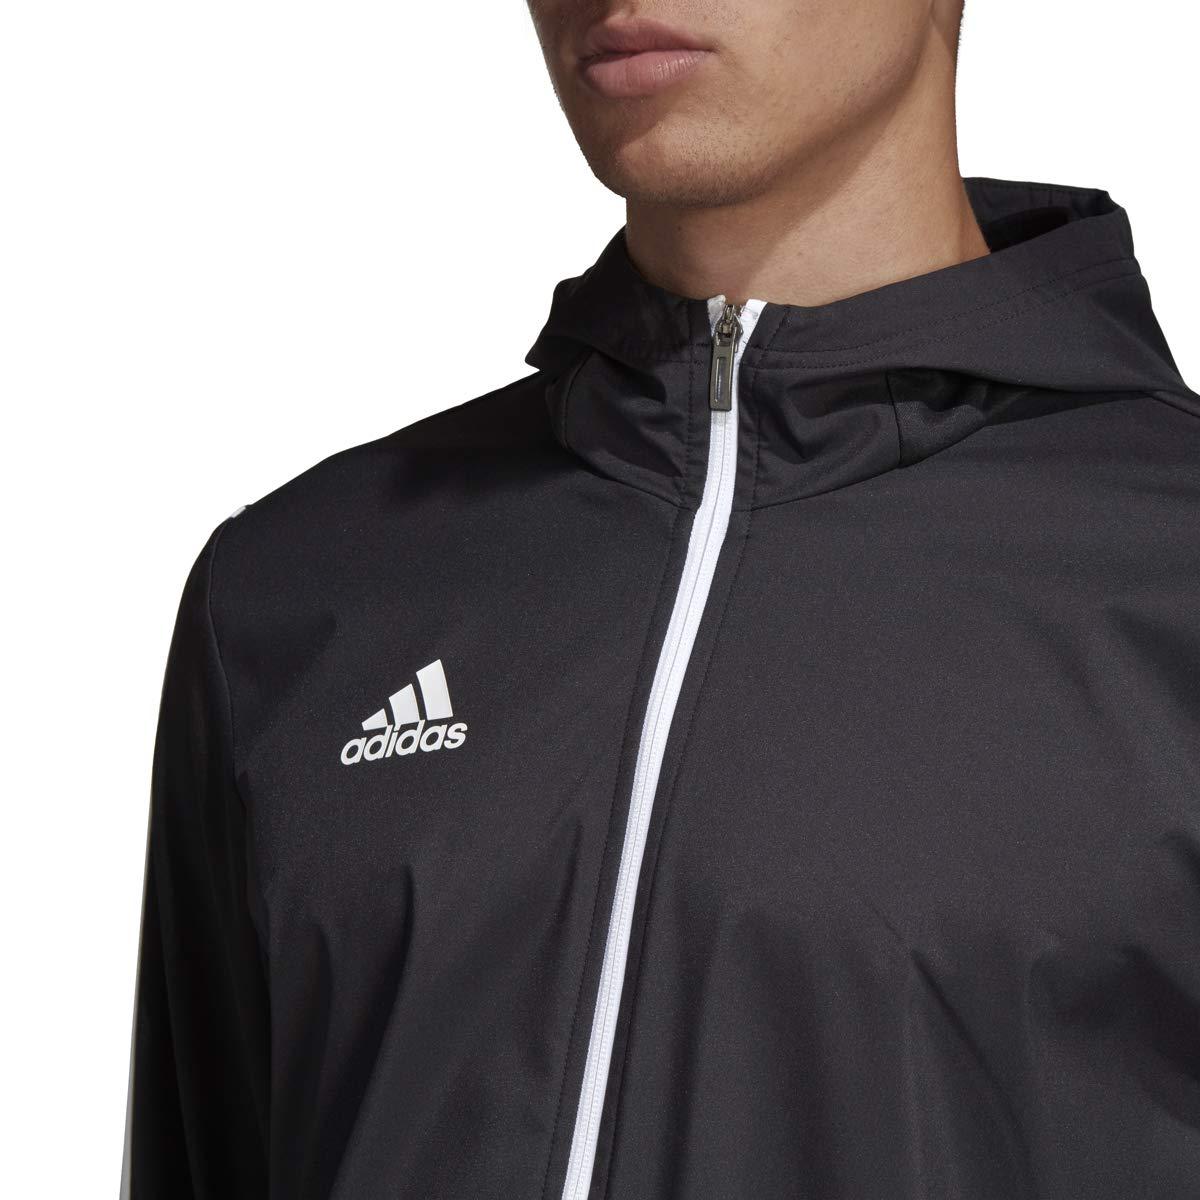 30cbac0e4a31 adidas Men s Tiro 19 Warm Jacket at Amazon Men s Clothing store